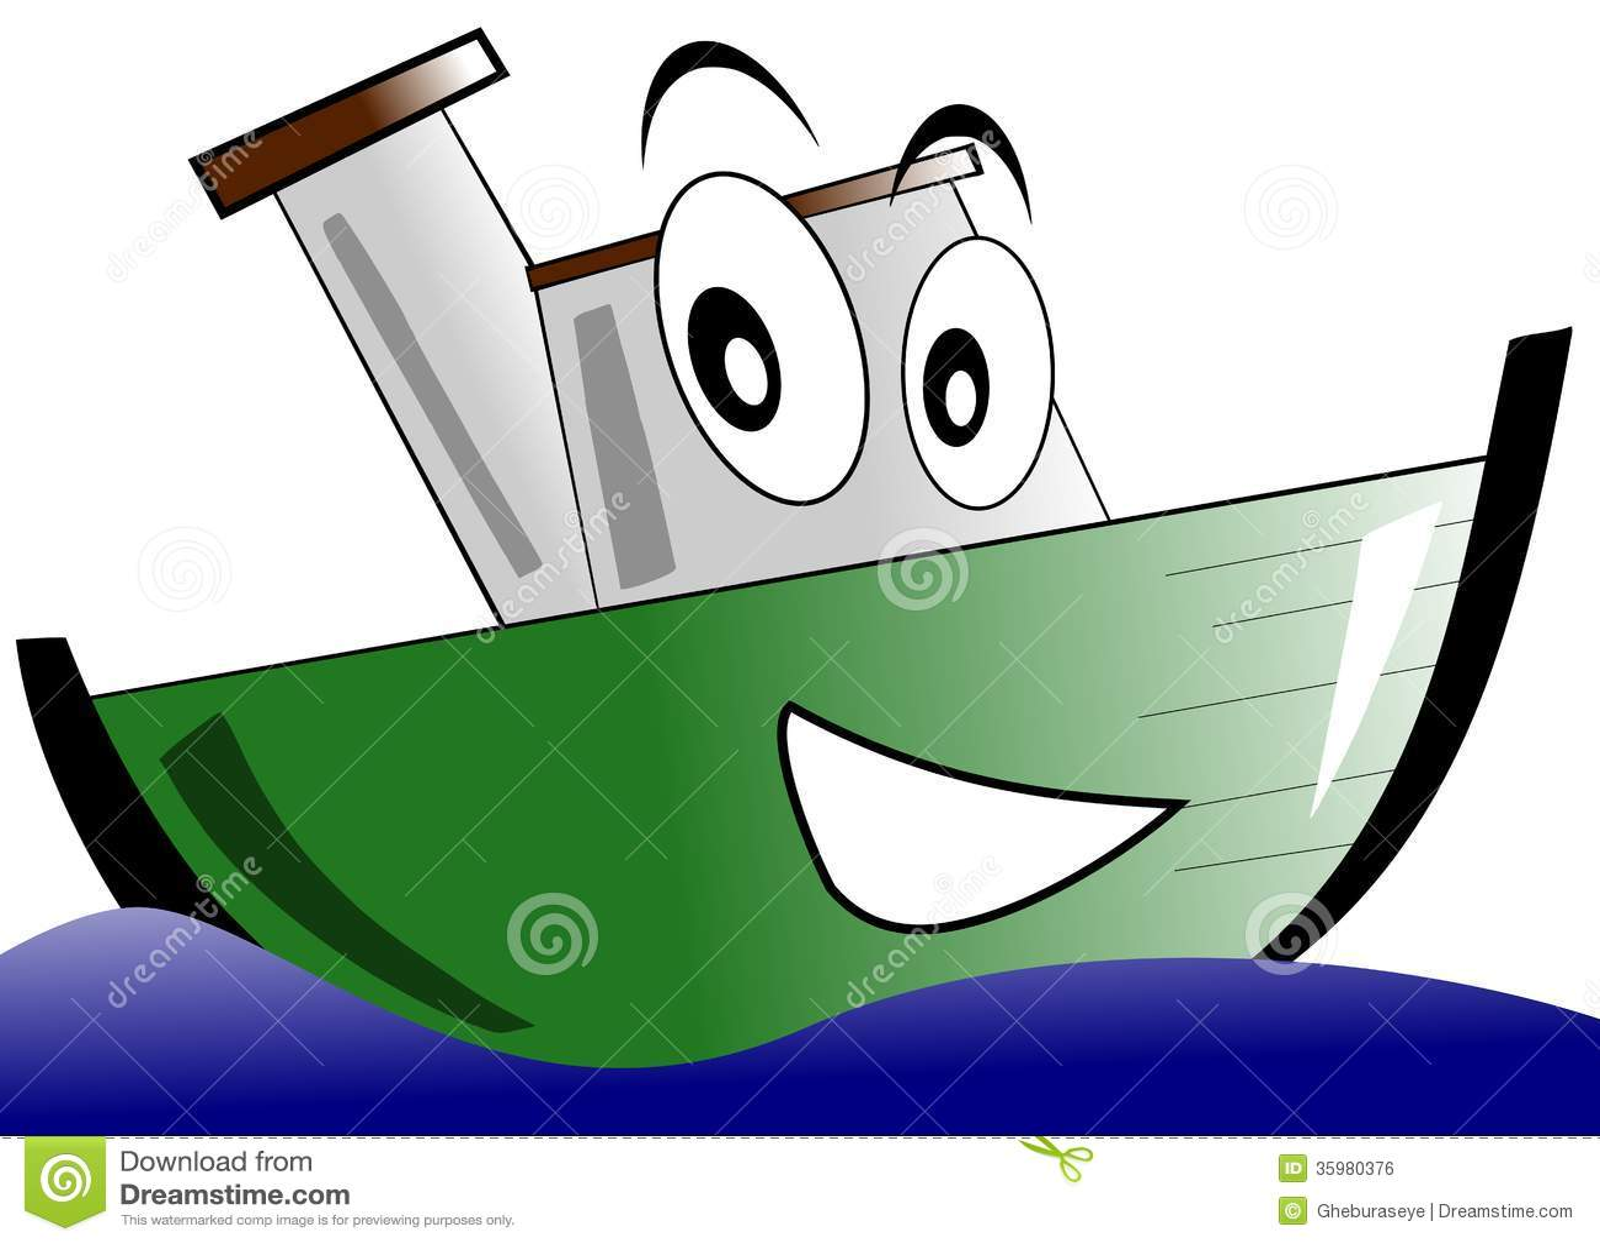 Smiling Isolated Cartoon Boat Royalty Free Stock Image - Image ...